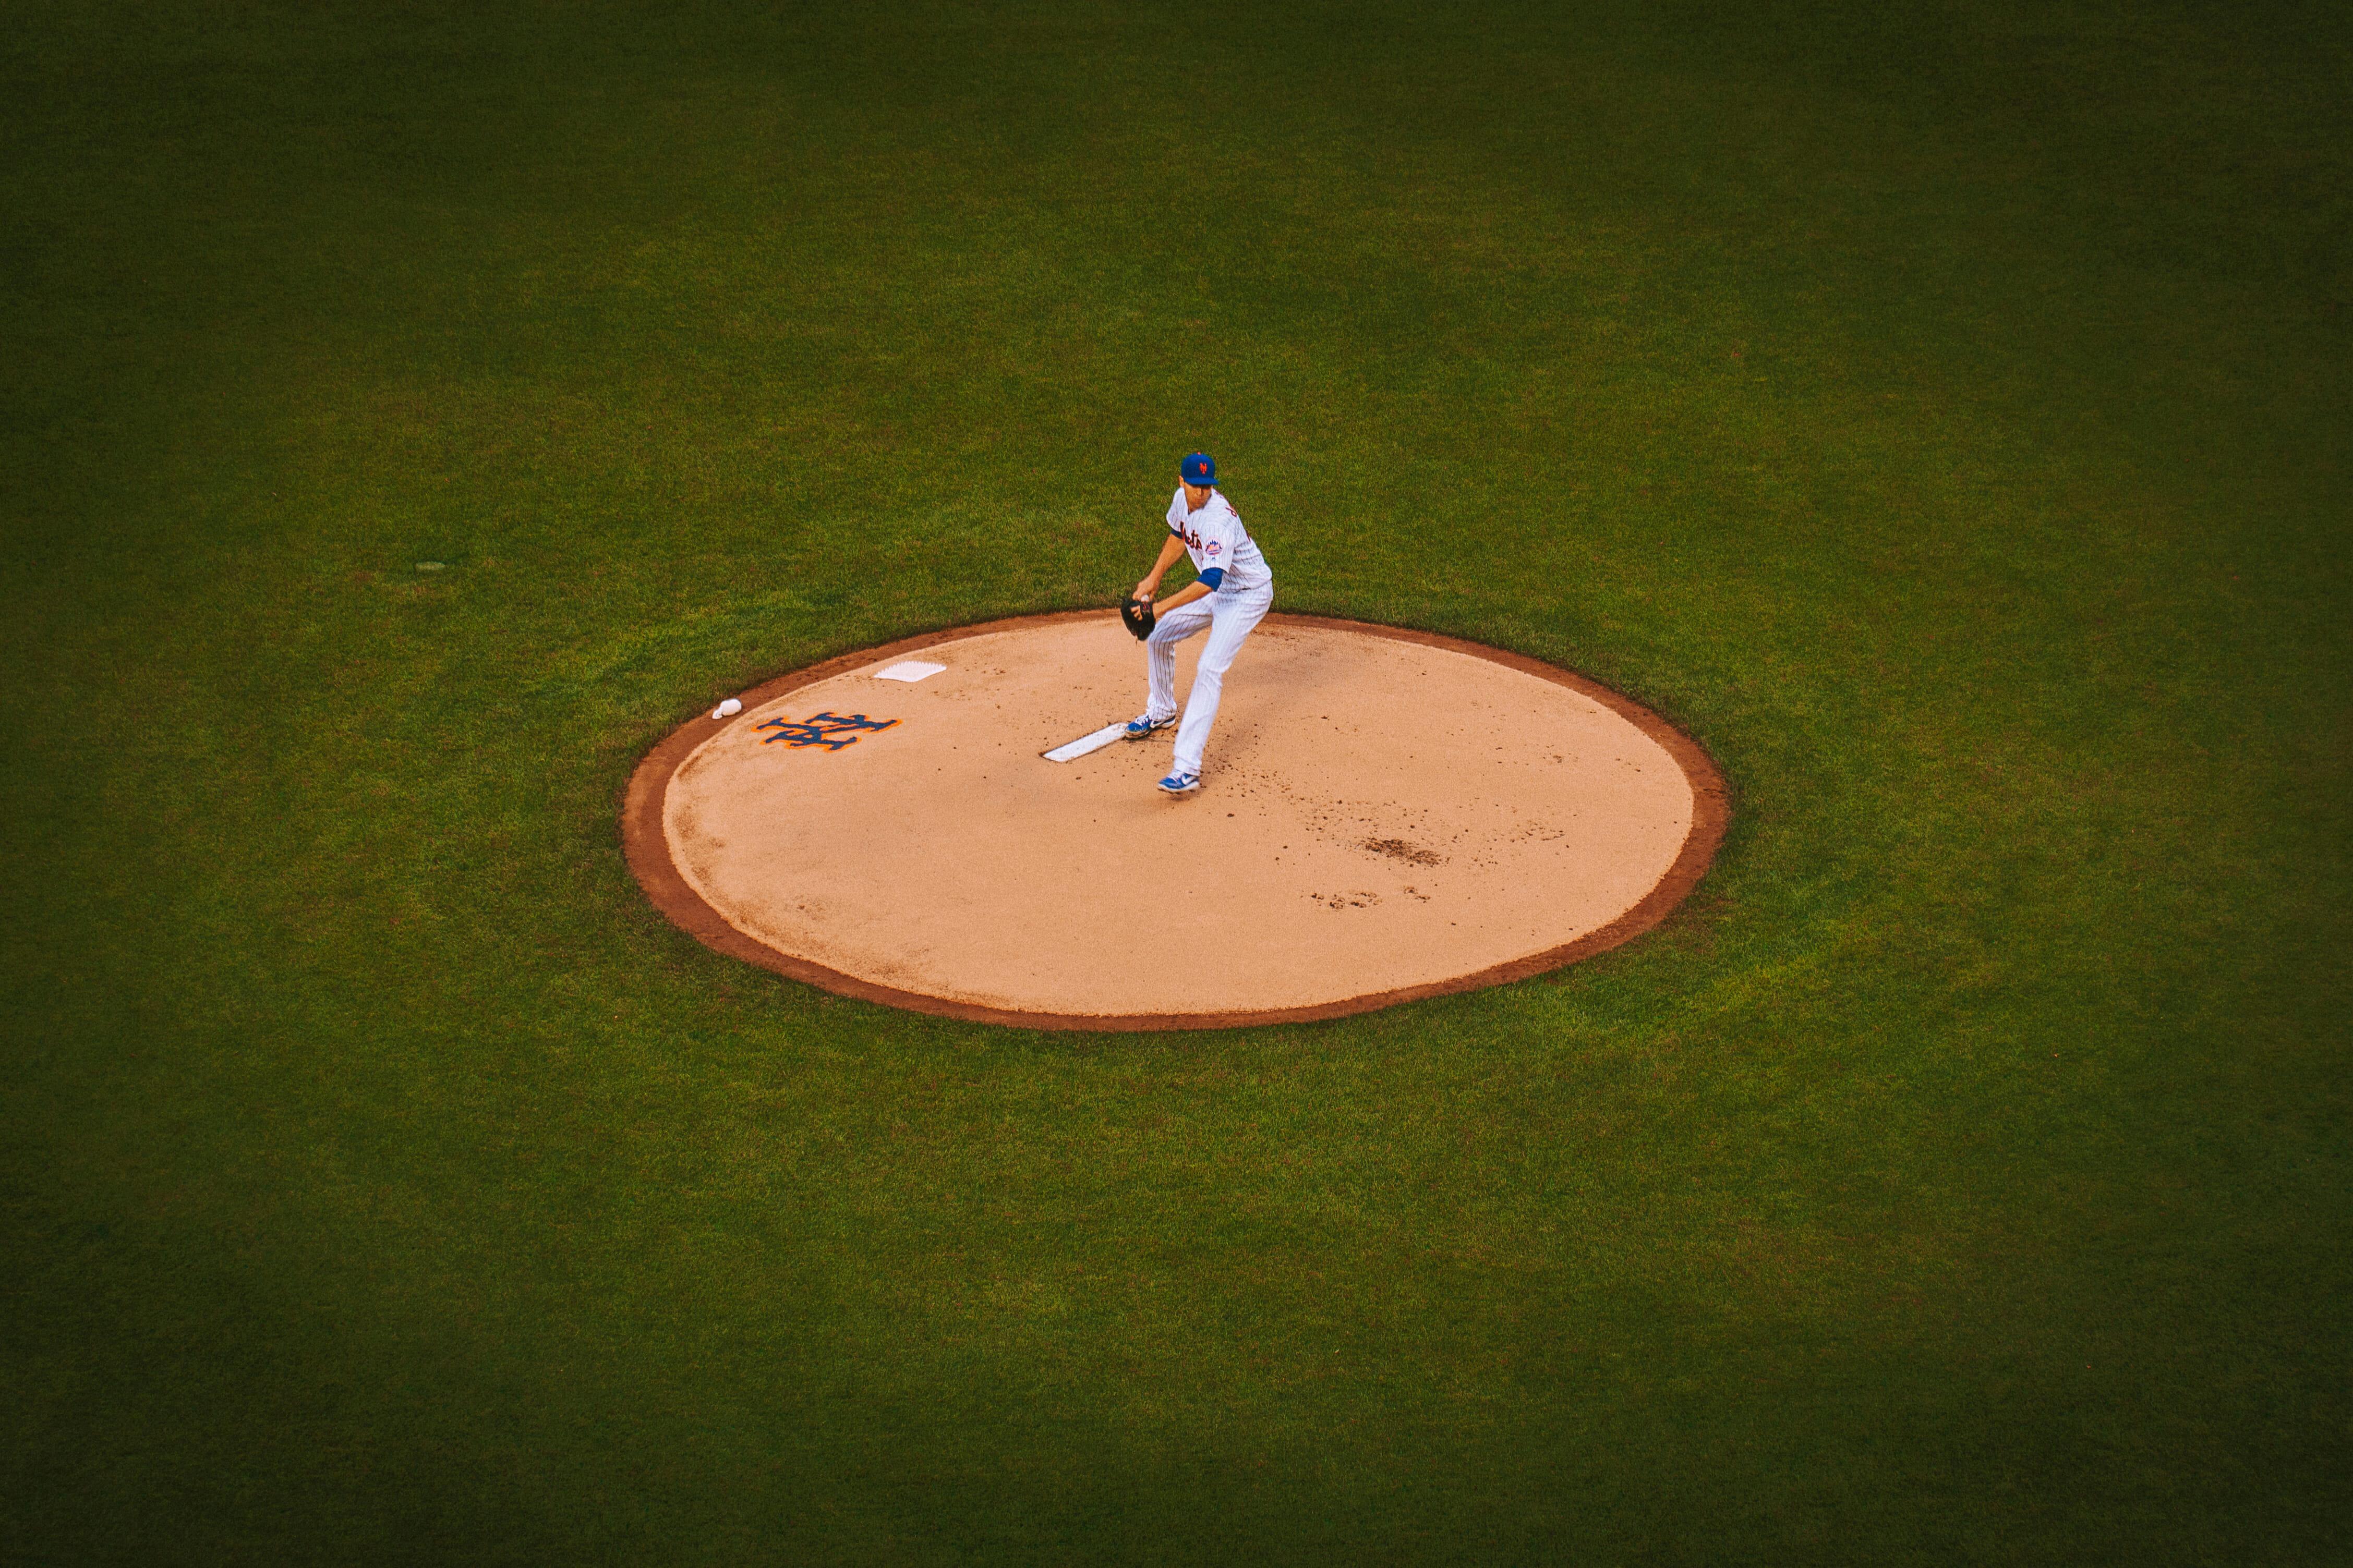 New York Mets Baseball Player High Quality Wallpaper